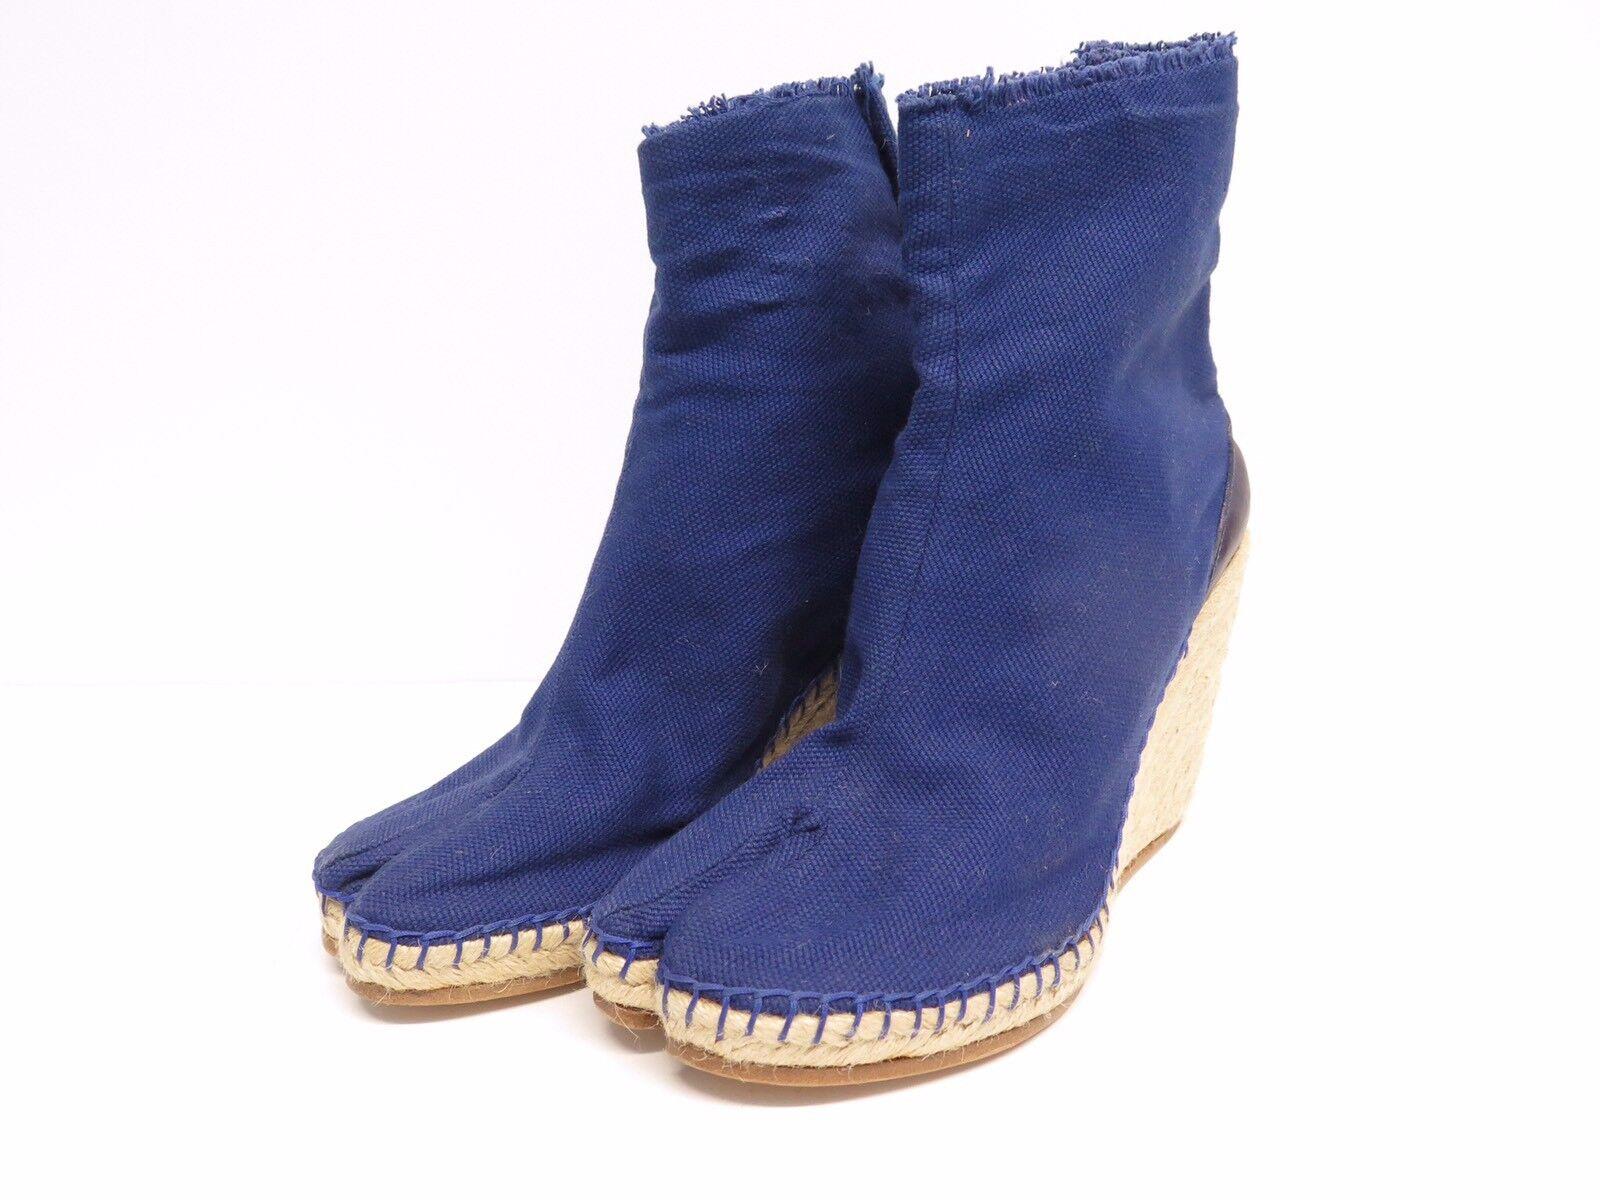 Maison Martin Margiela 22 Blue Canvas Wedge Tabi Espadrille Boots Sz 36